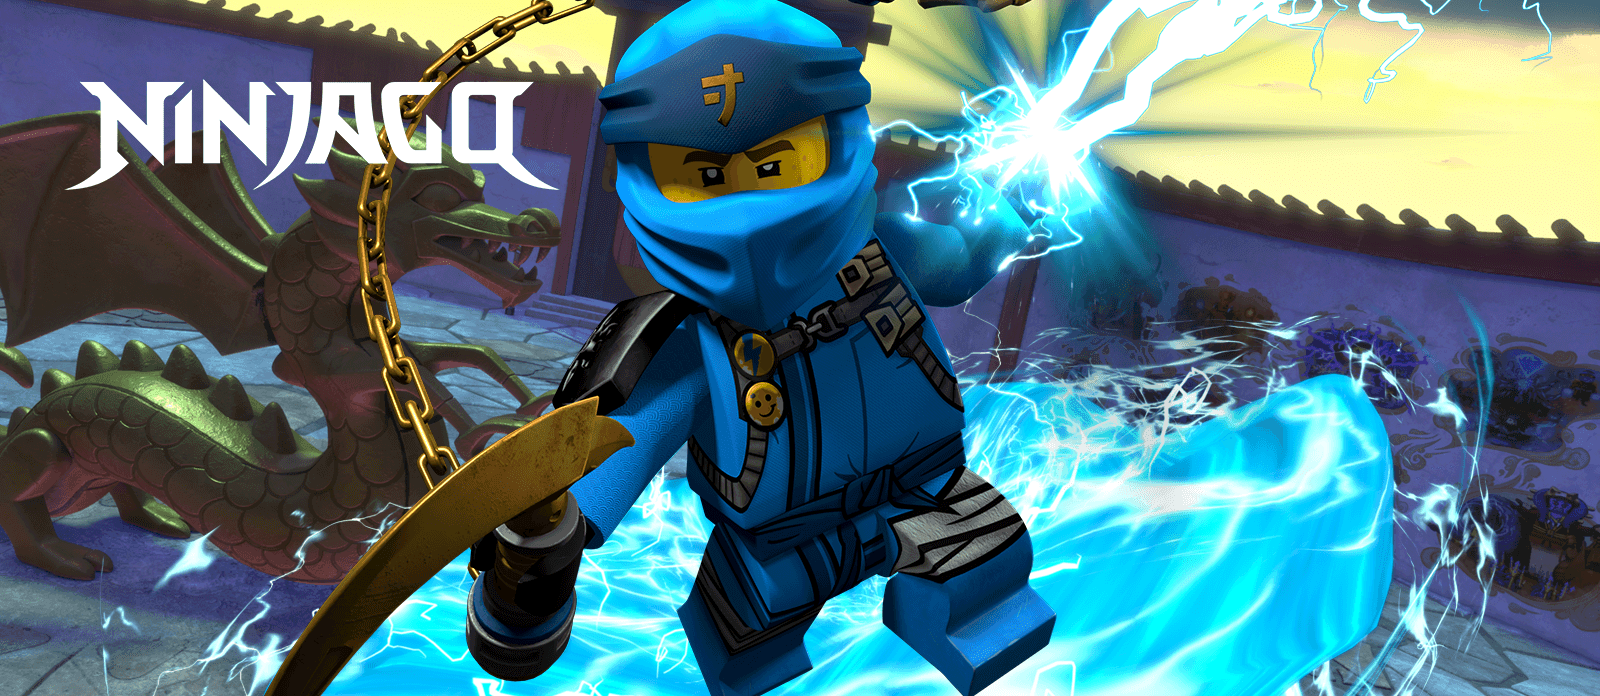 LEGO Ninjago 71721 Конструктор ЛЕГО Ниндзяго Дракон чародея-скелета